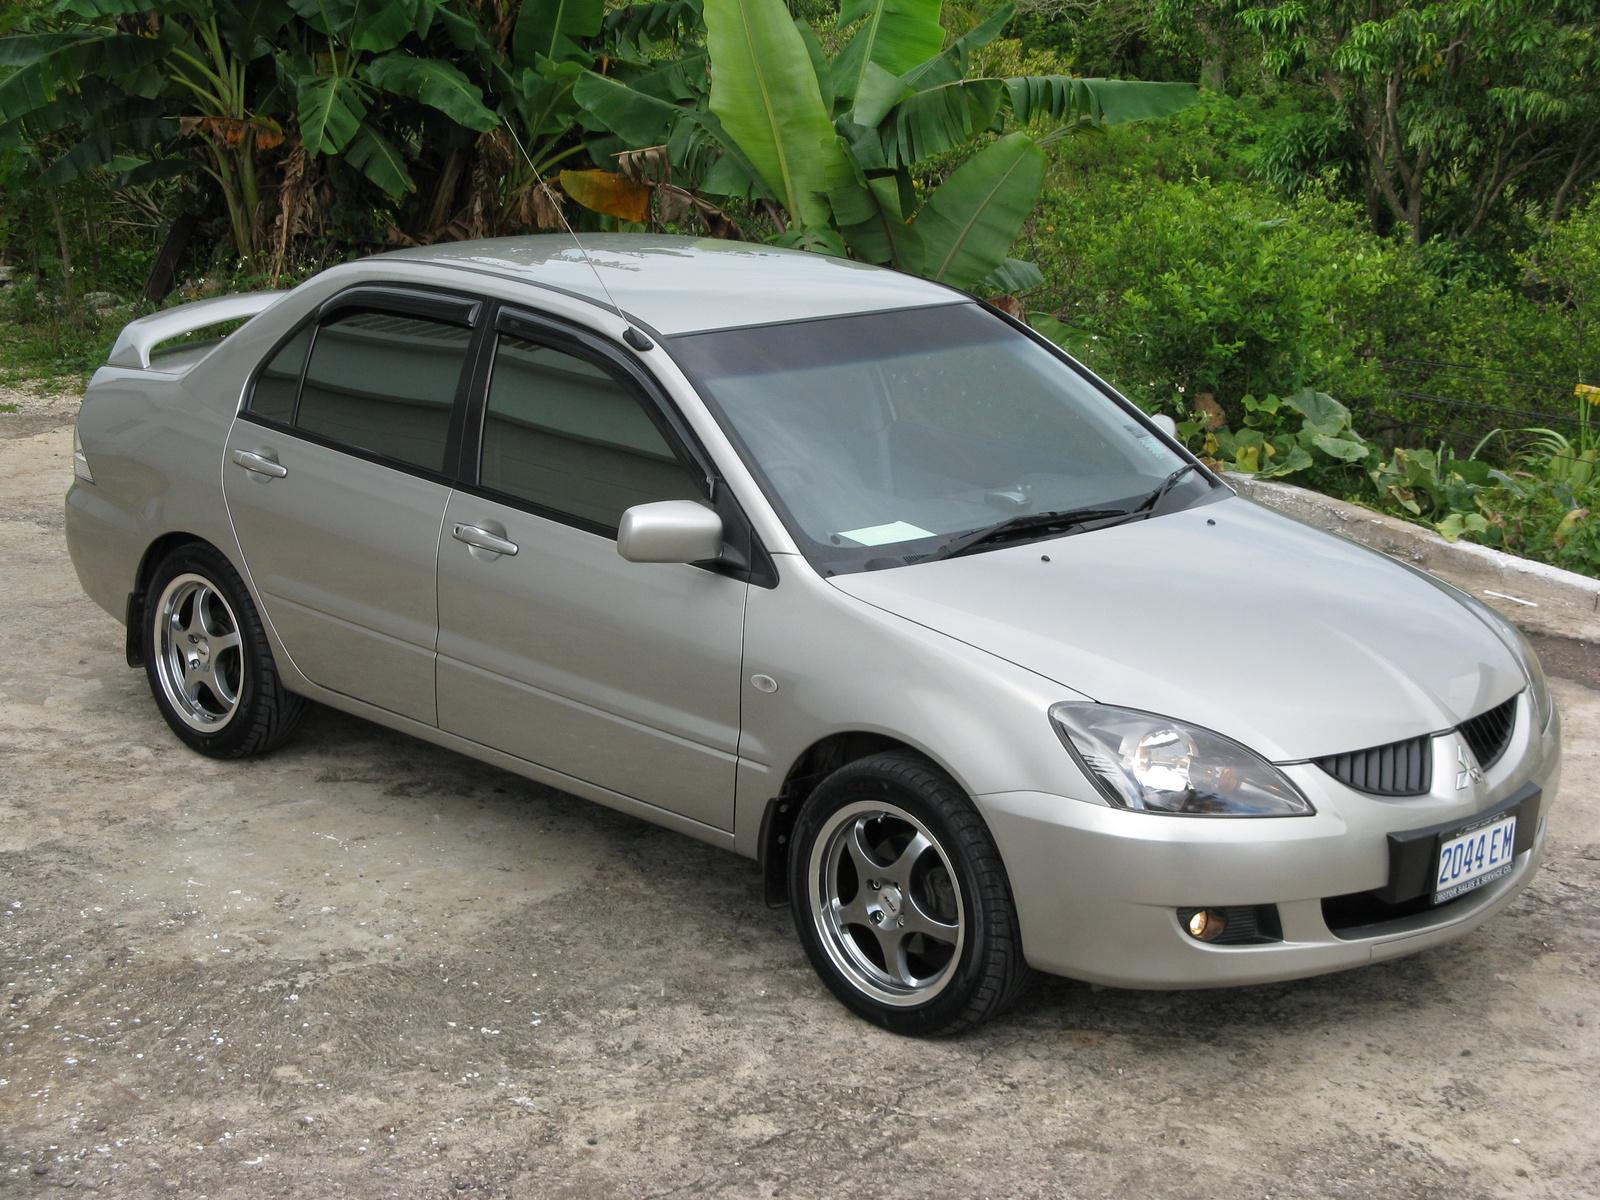 2005 Mitsubishi Lancer Pictures Cargurus